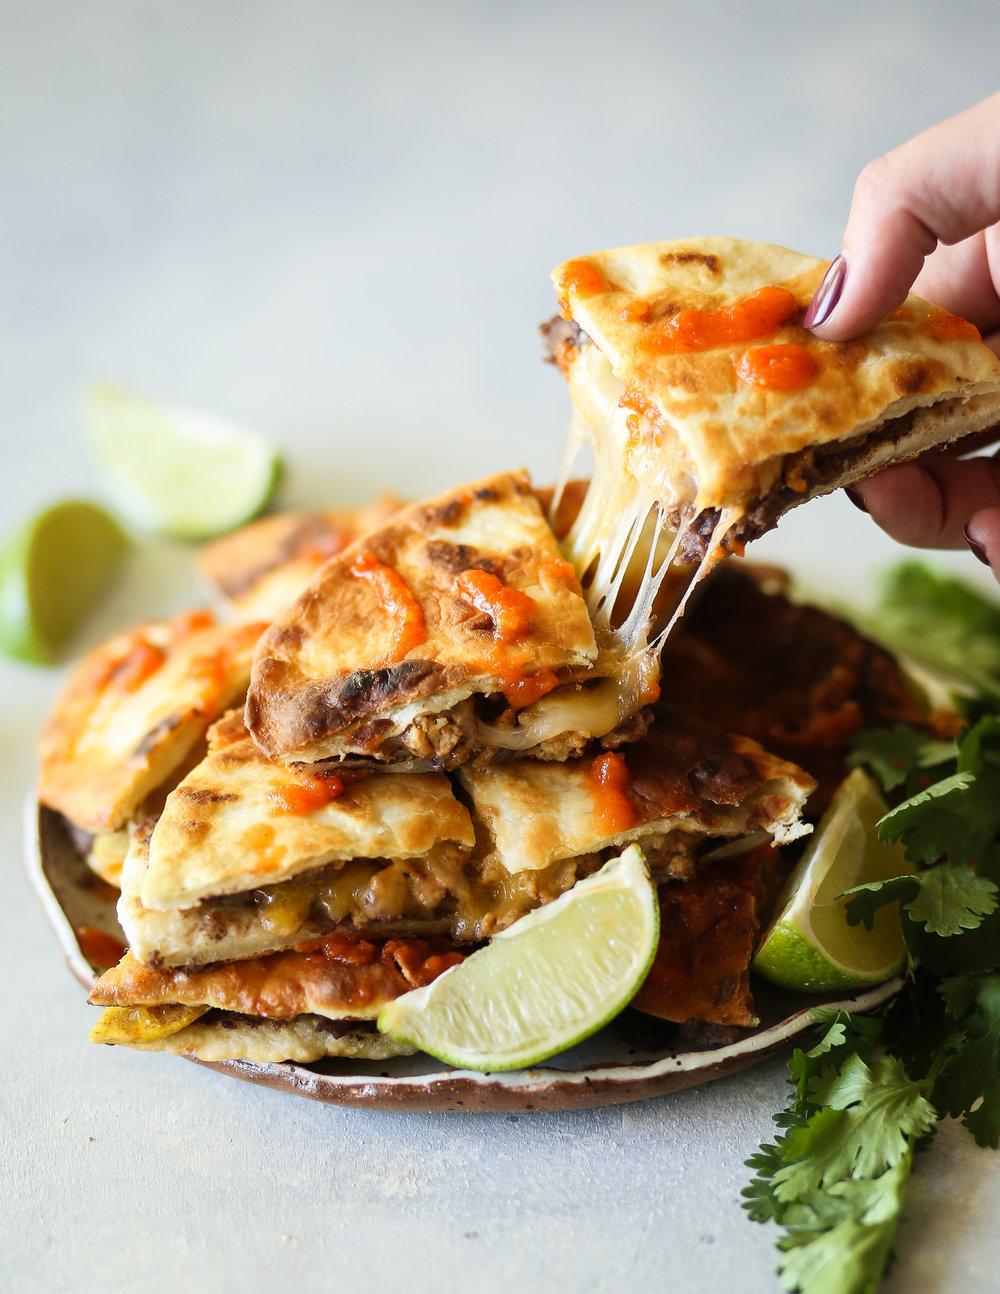 Loade Belizean Fry Jacks | Set the Table